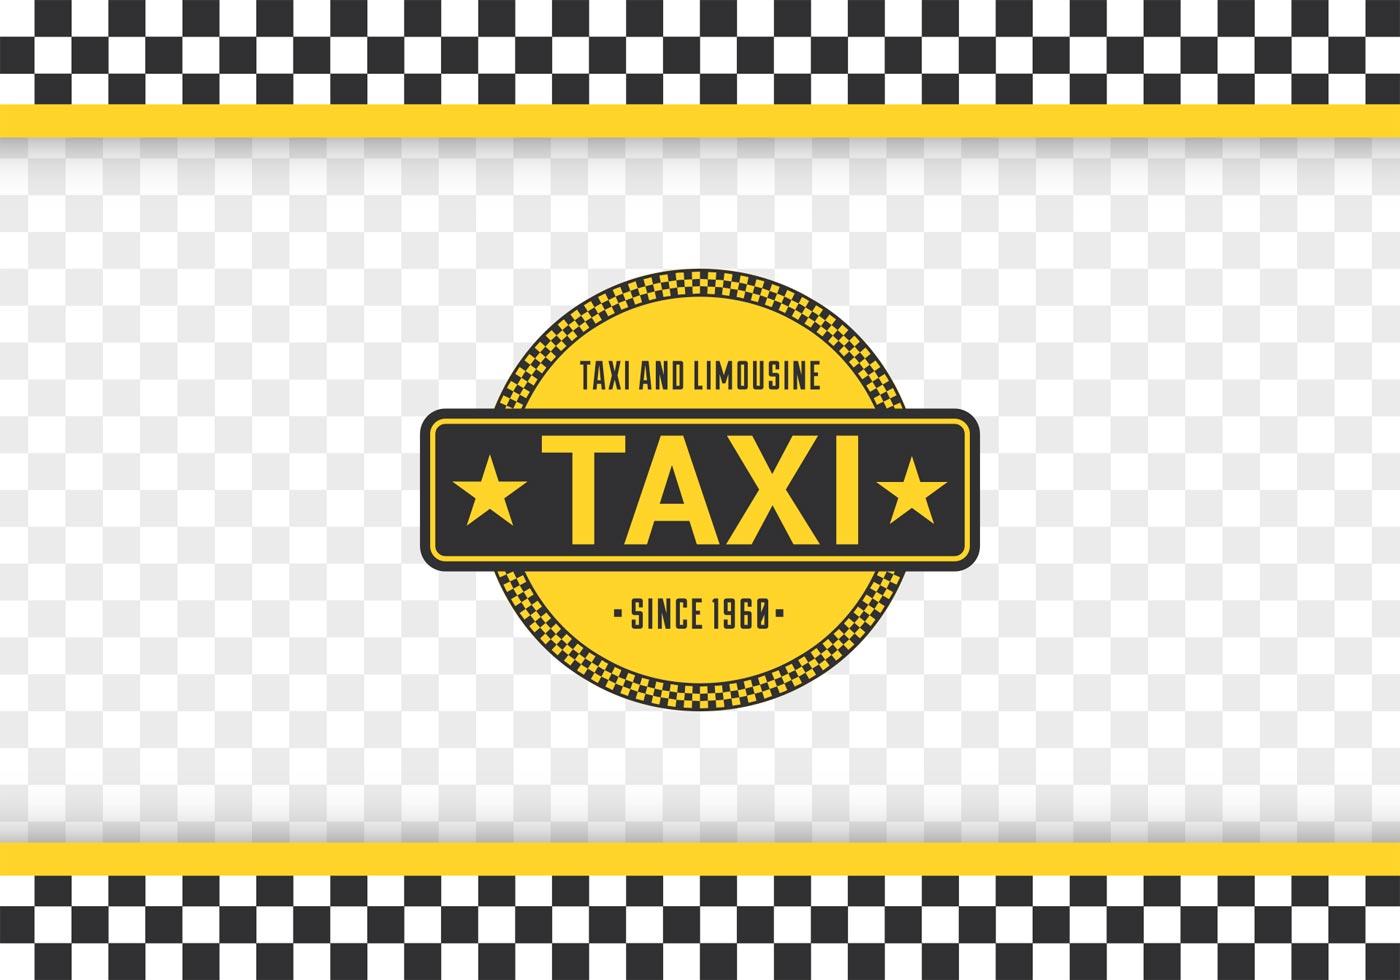 free taxi checkerboard vektor hintergrund 91896 vektor kunst bei vecteezy  vecteezy